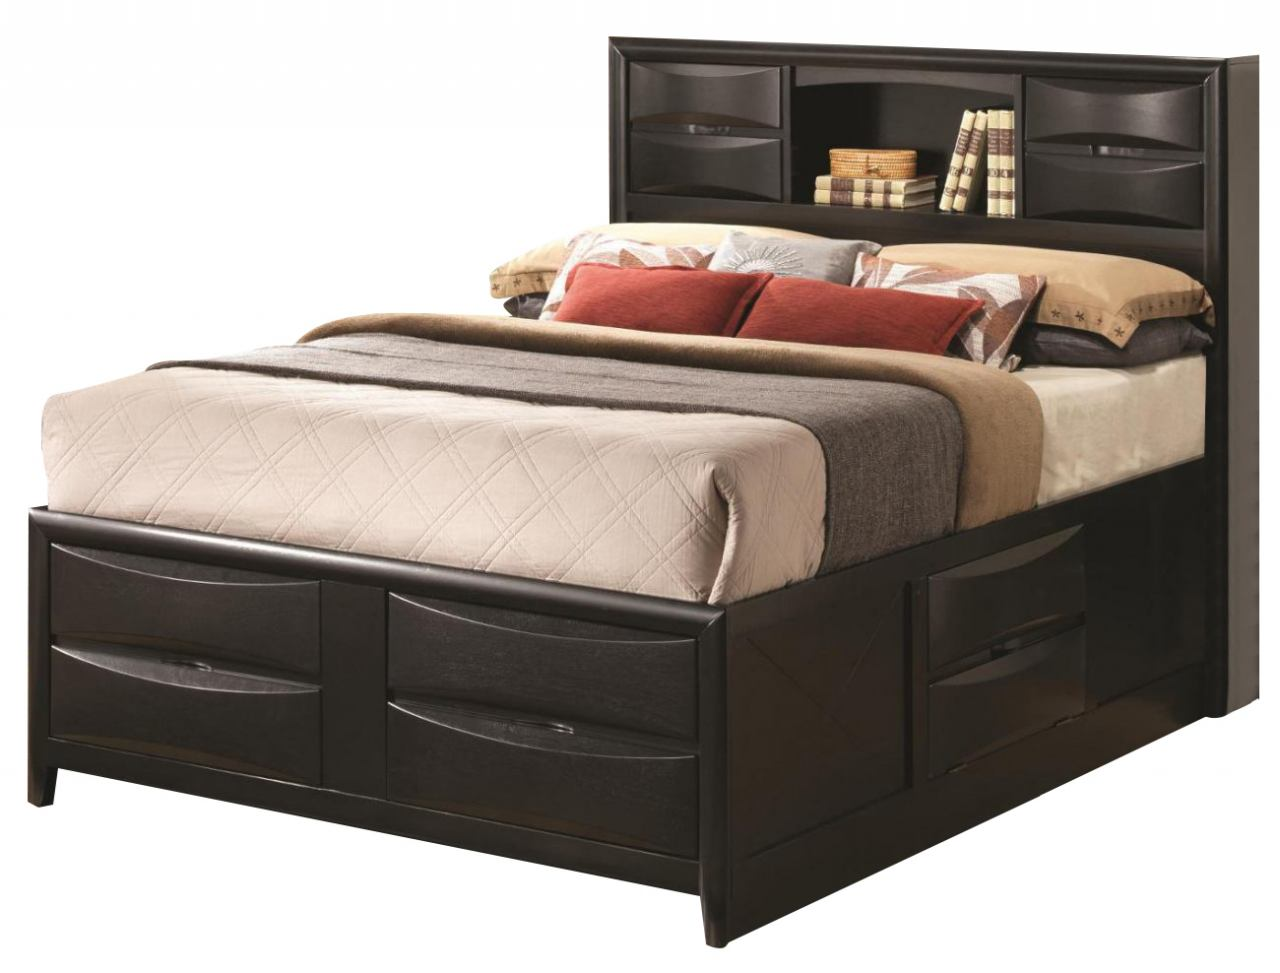 Briana Queen Storage Bed With Bookcase Headboard Marjen